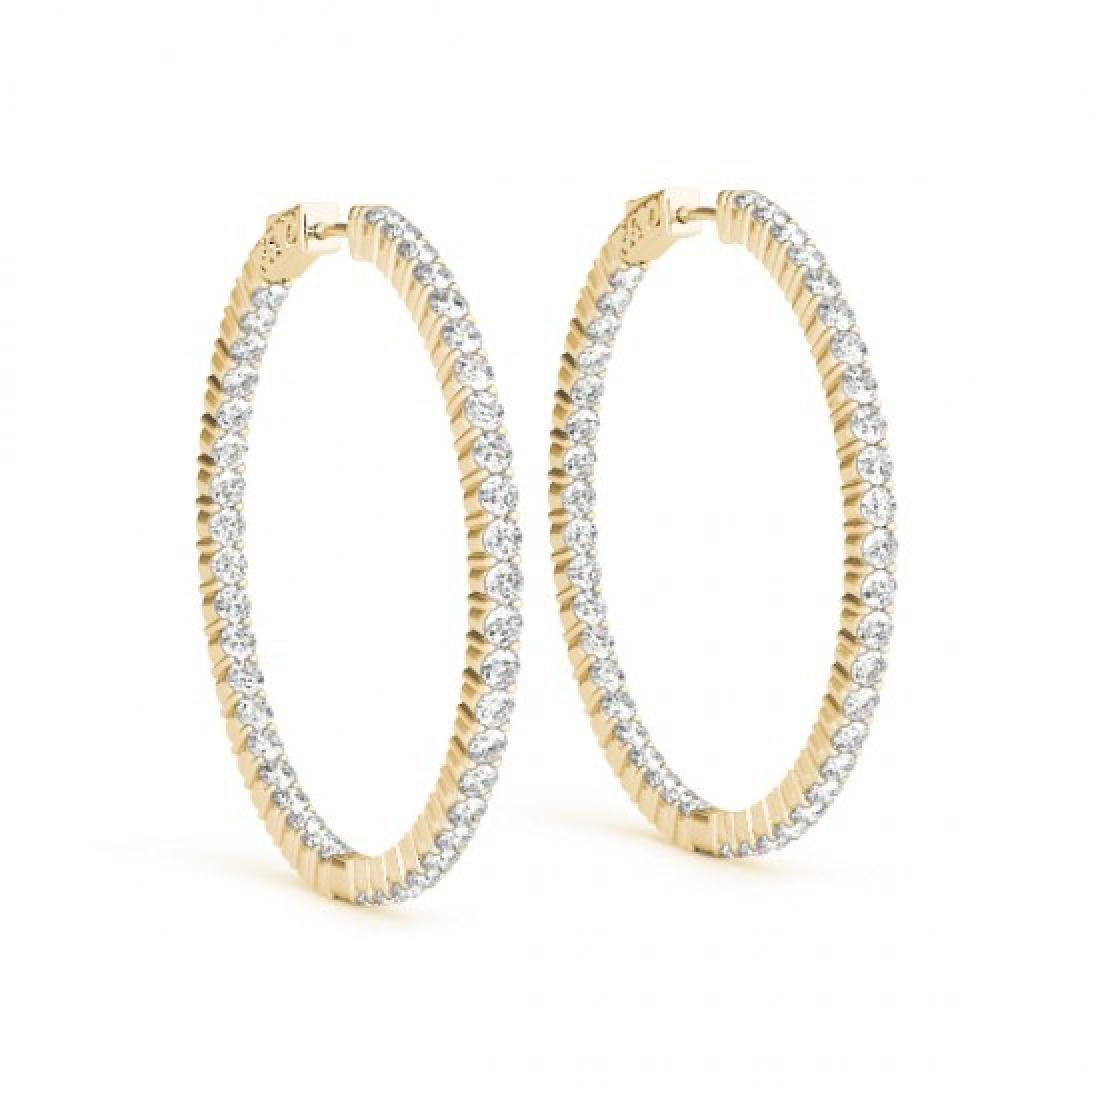 2 CTW Diamond VS/SI Certified 22 Mm Hoop Earrings 14K - 2